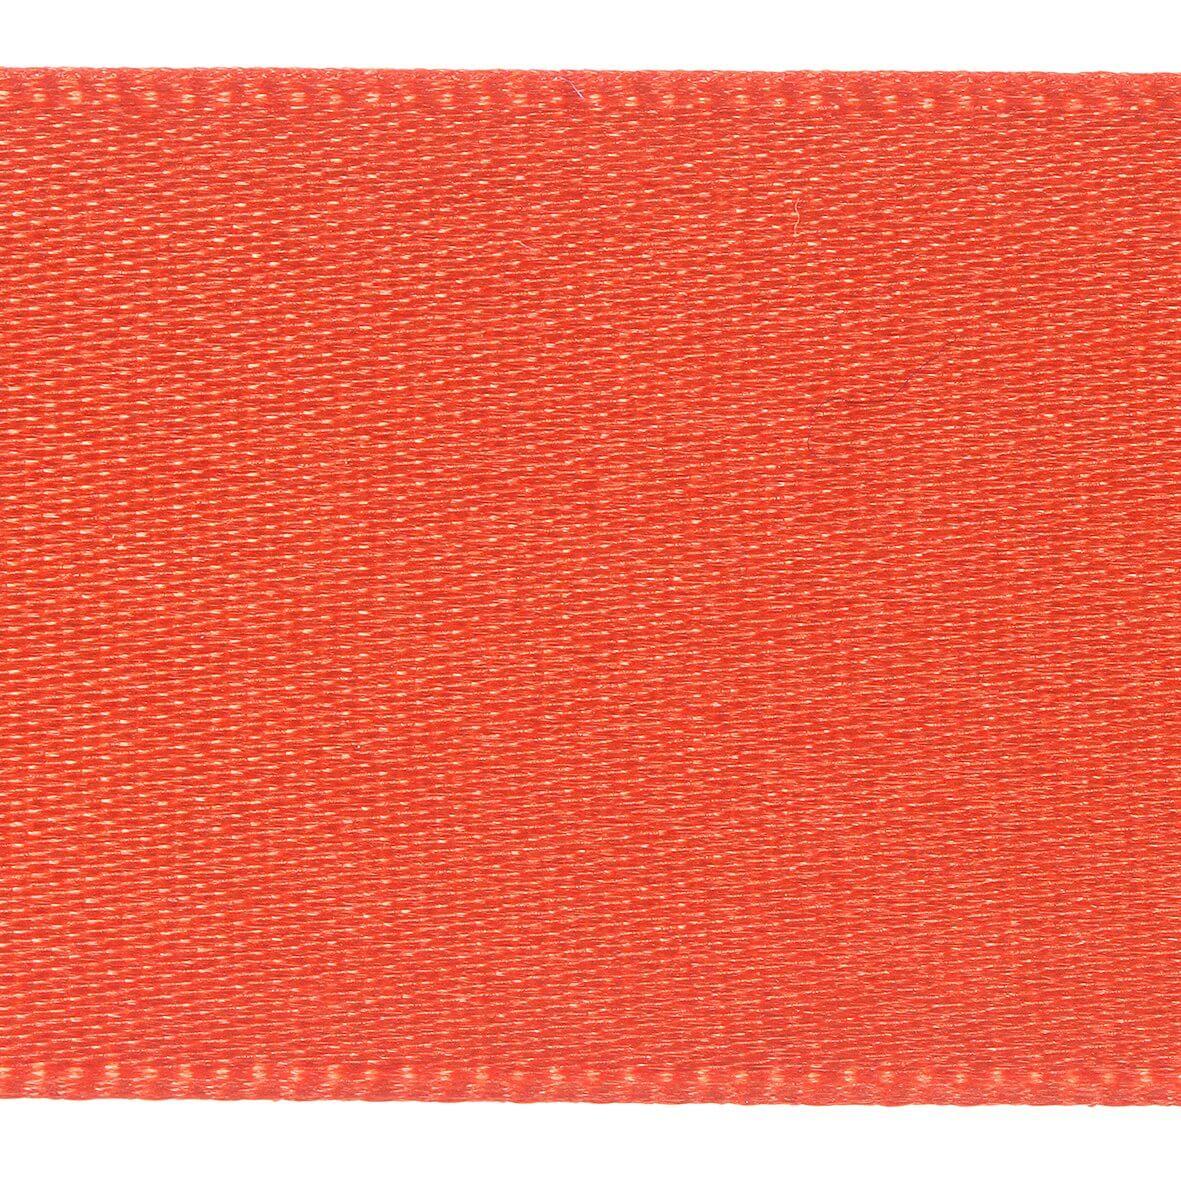 10mm Berisfords Satin Ribbon - Rust Colour 55